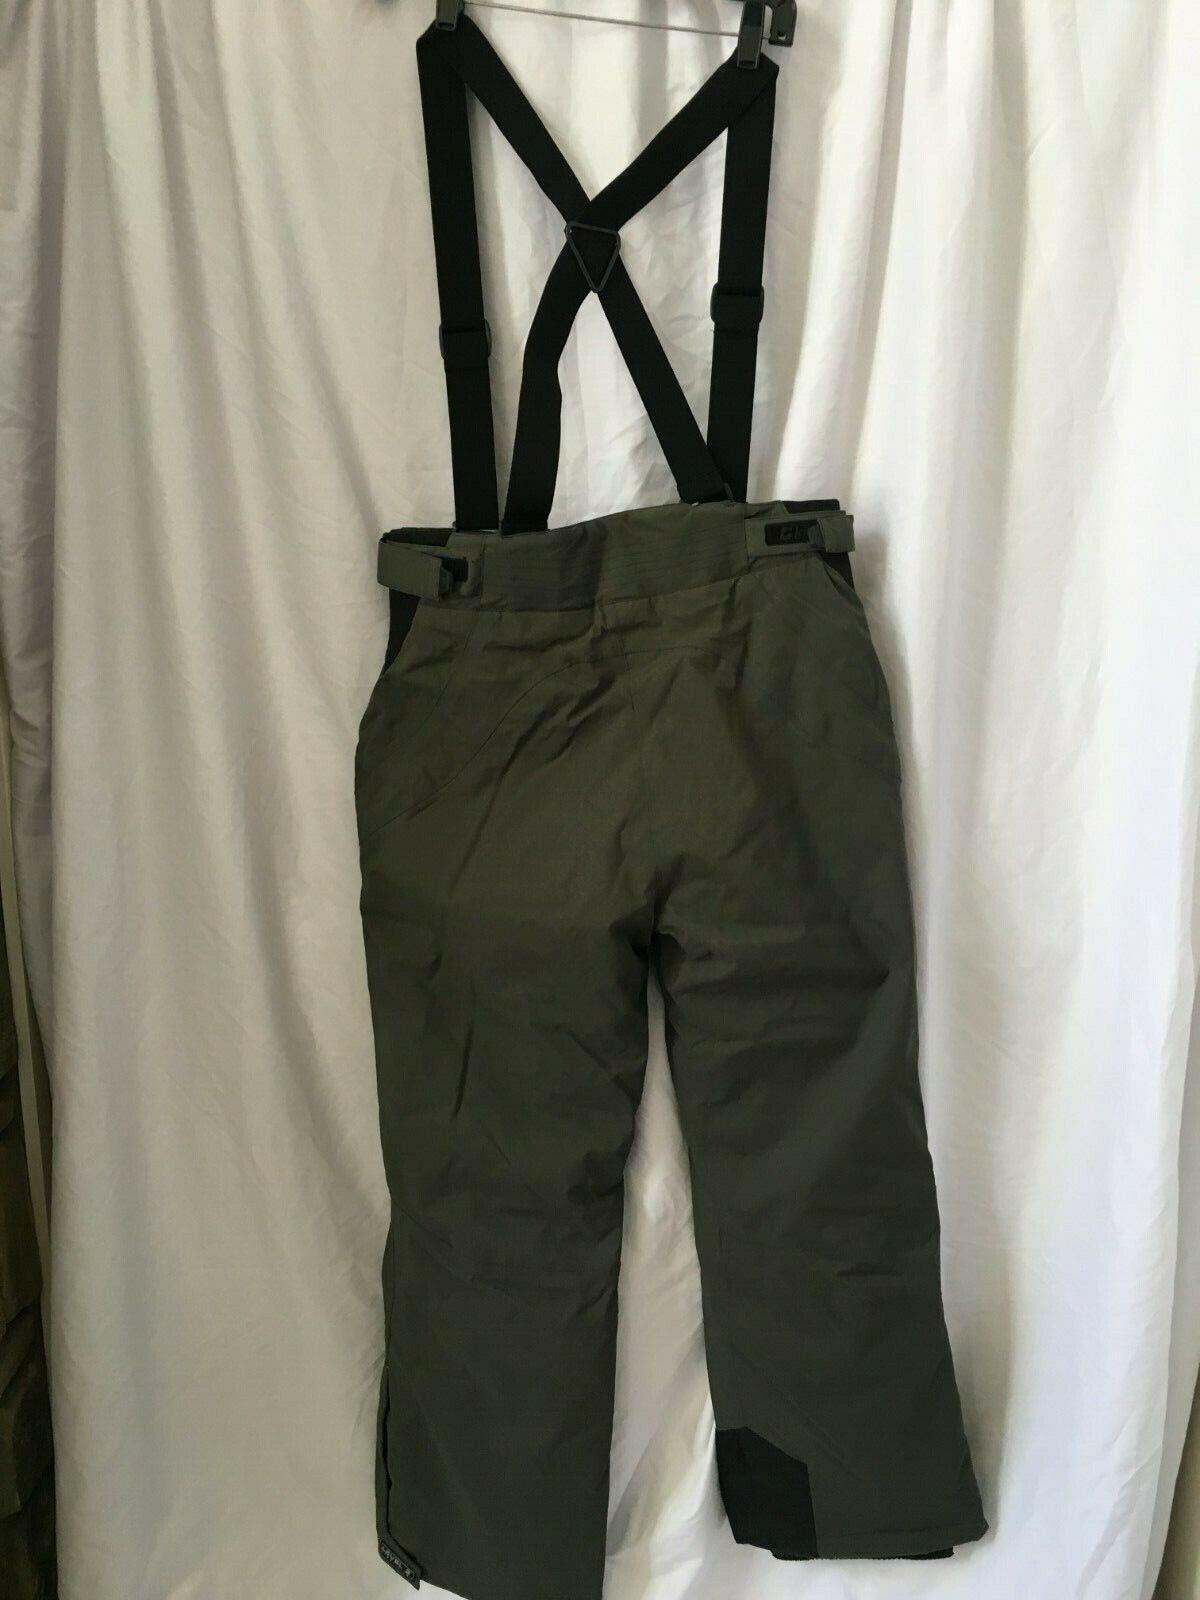 df067af584f NEW Killtec Catriona Women s Ski Pants with Straps - - - Size 12 ...